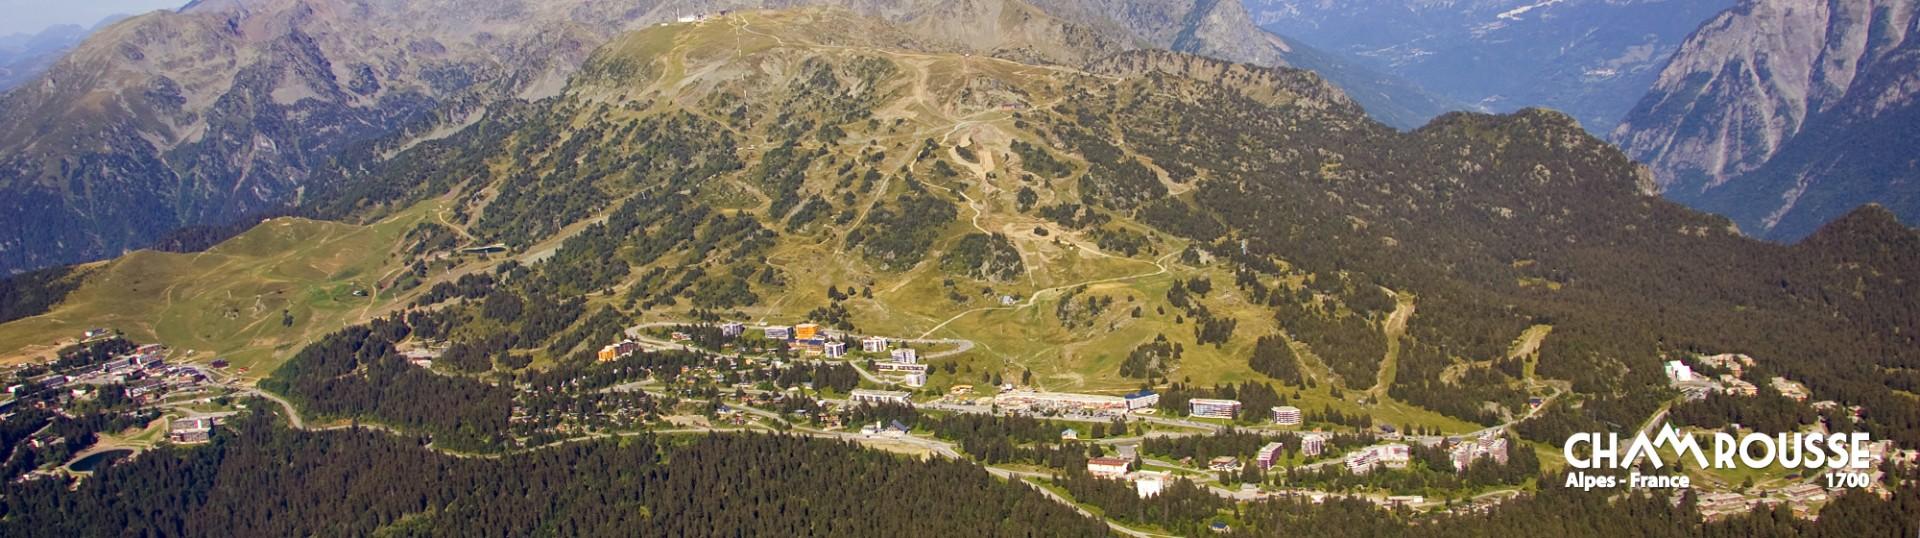 Chamrousse Bergstation